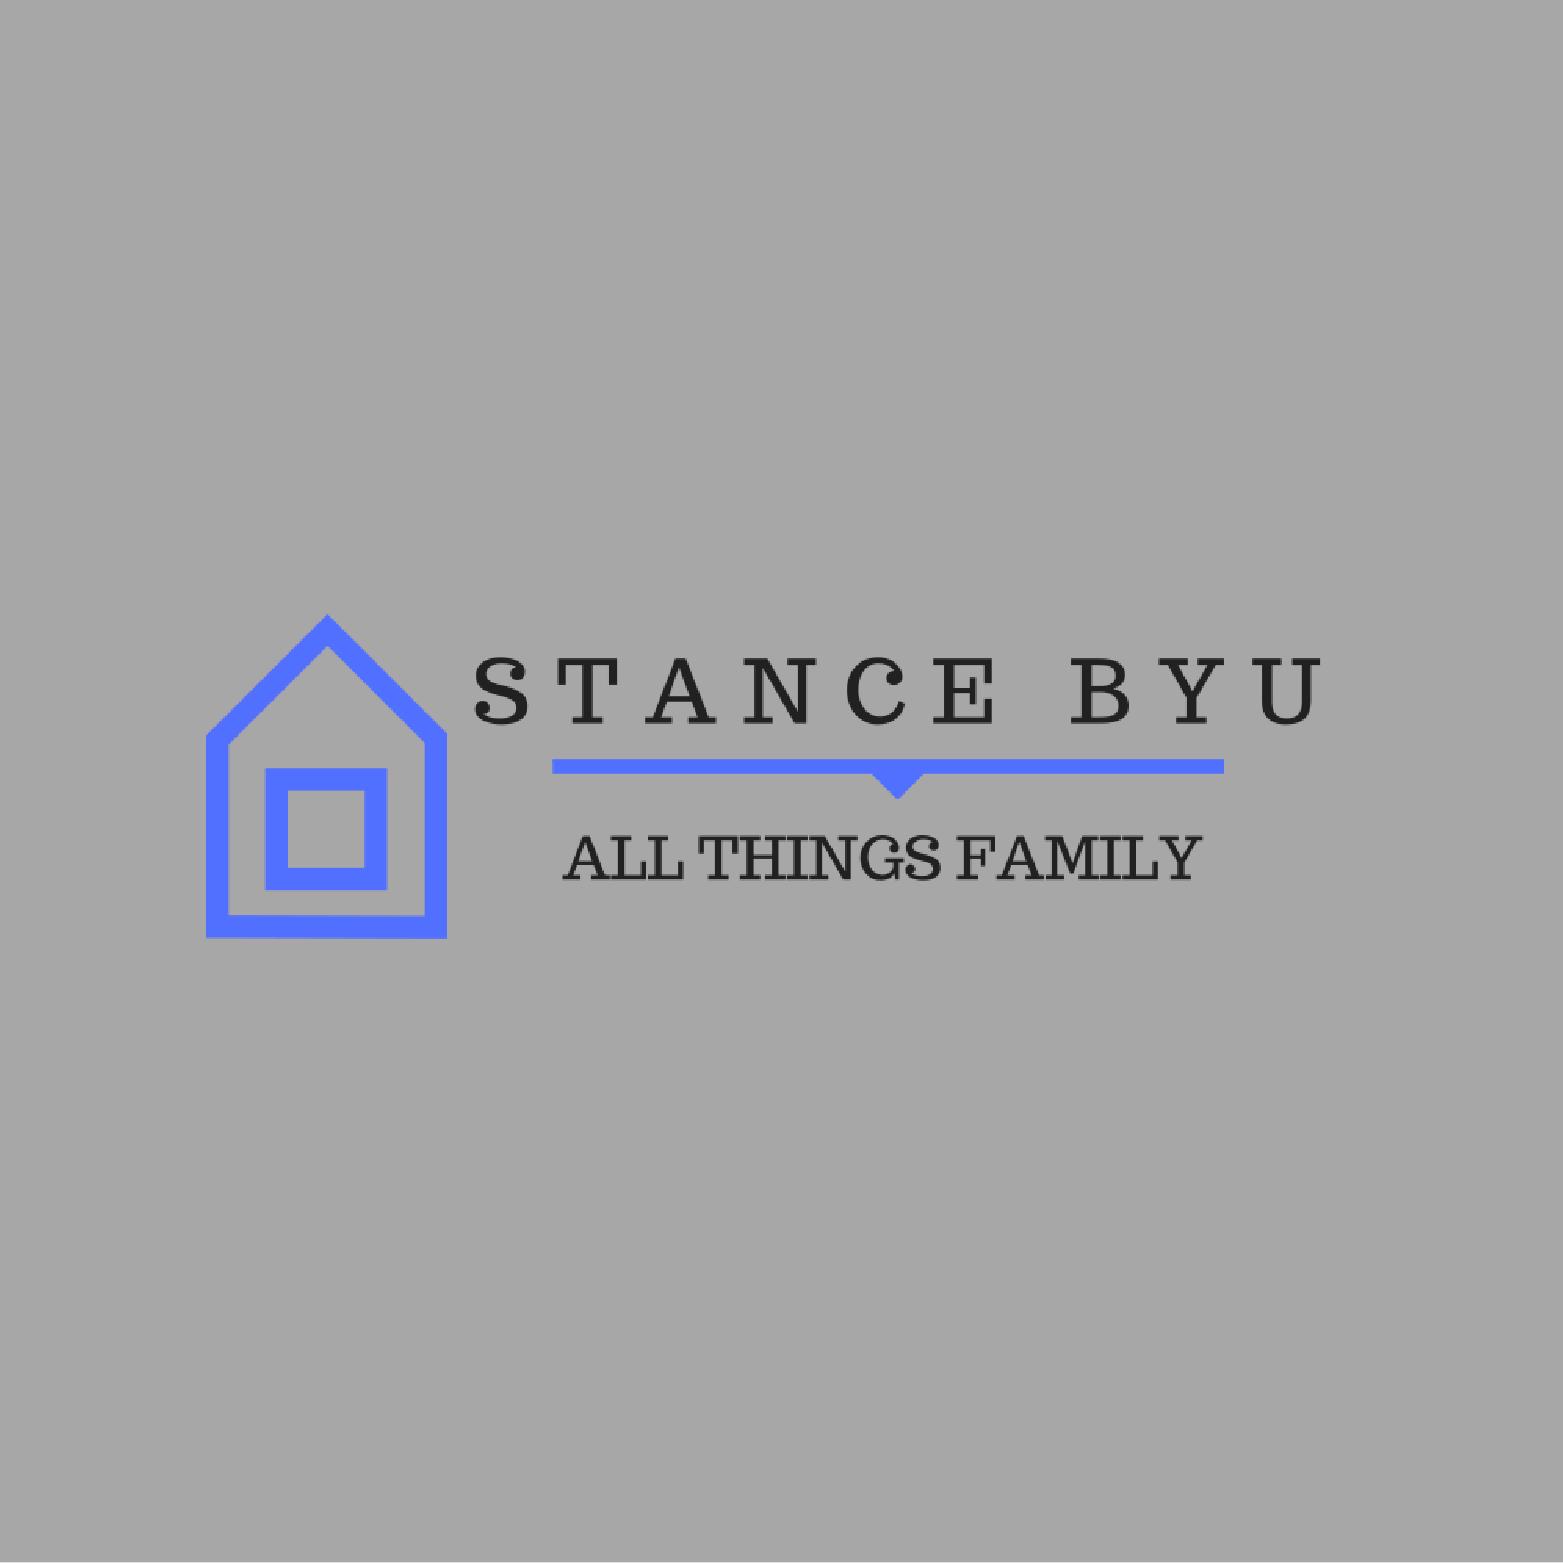 STANCE BYU- logo new